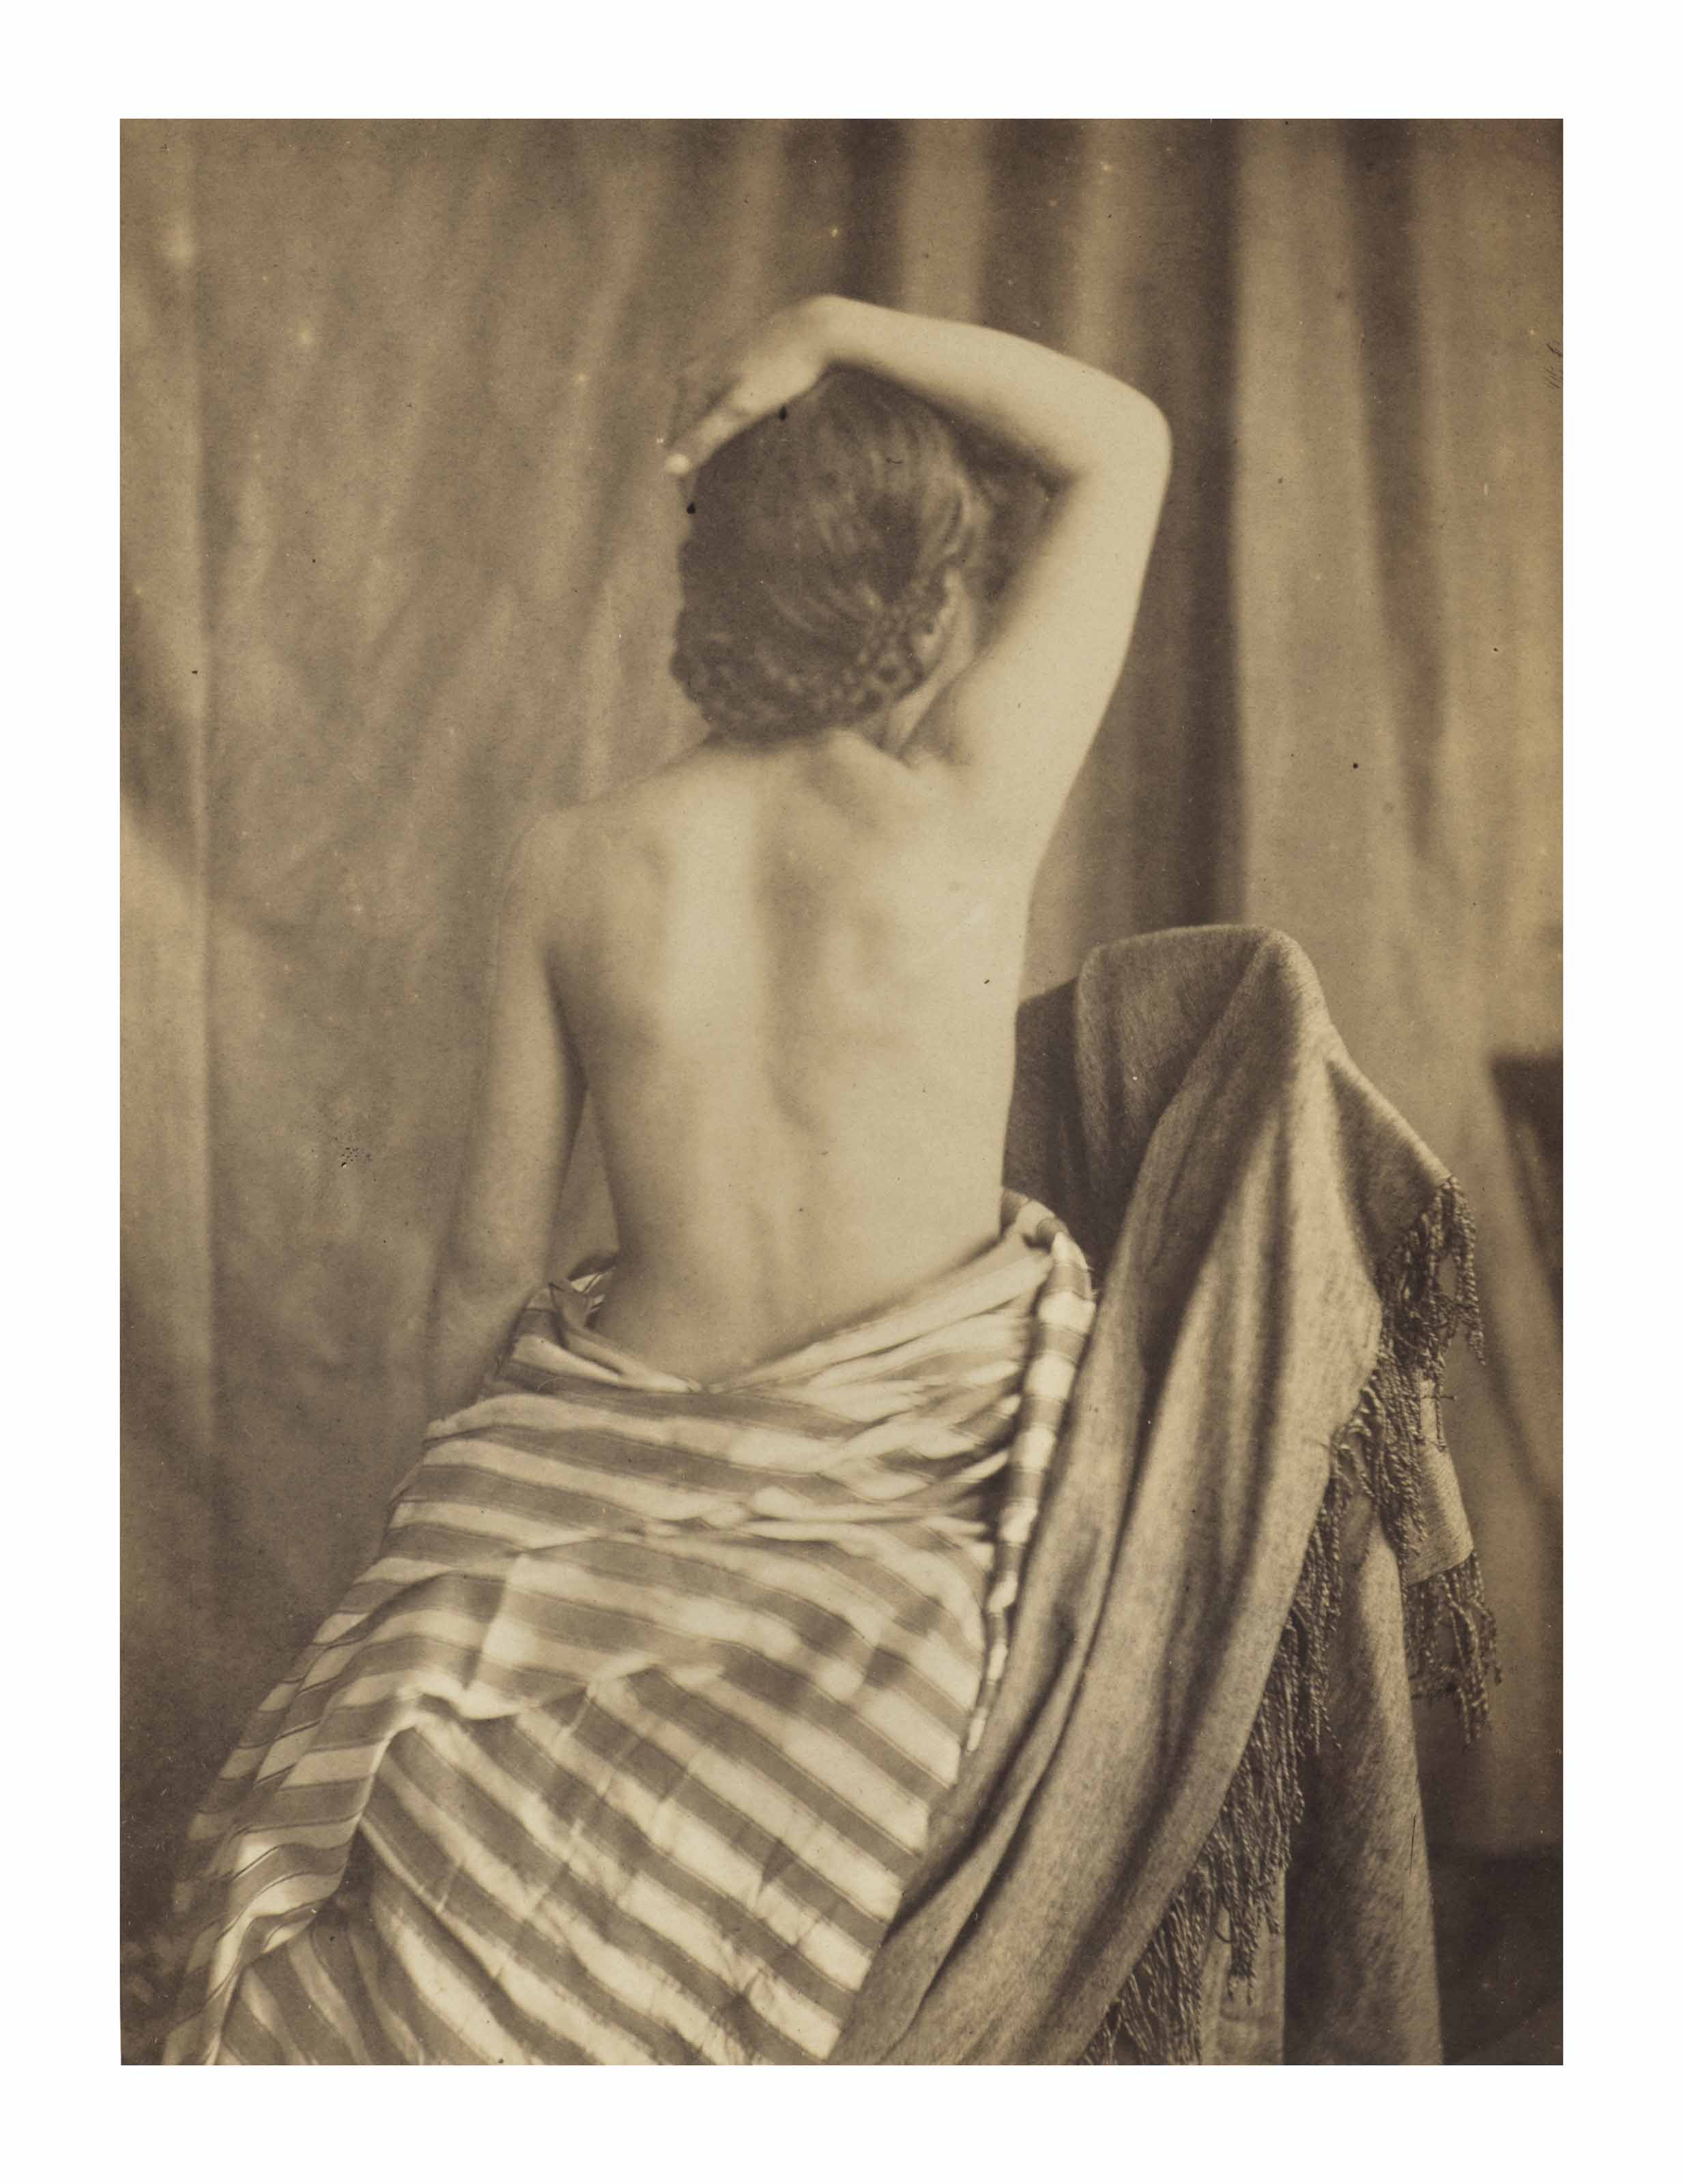 Model Posed by Delacroix, 1853–1854